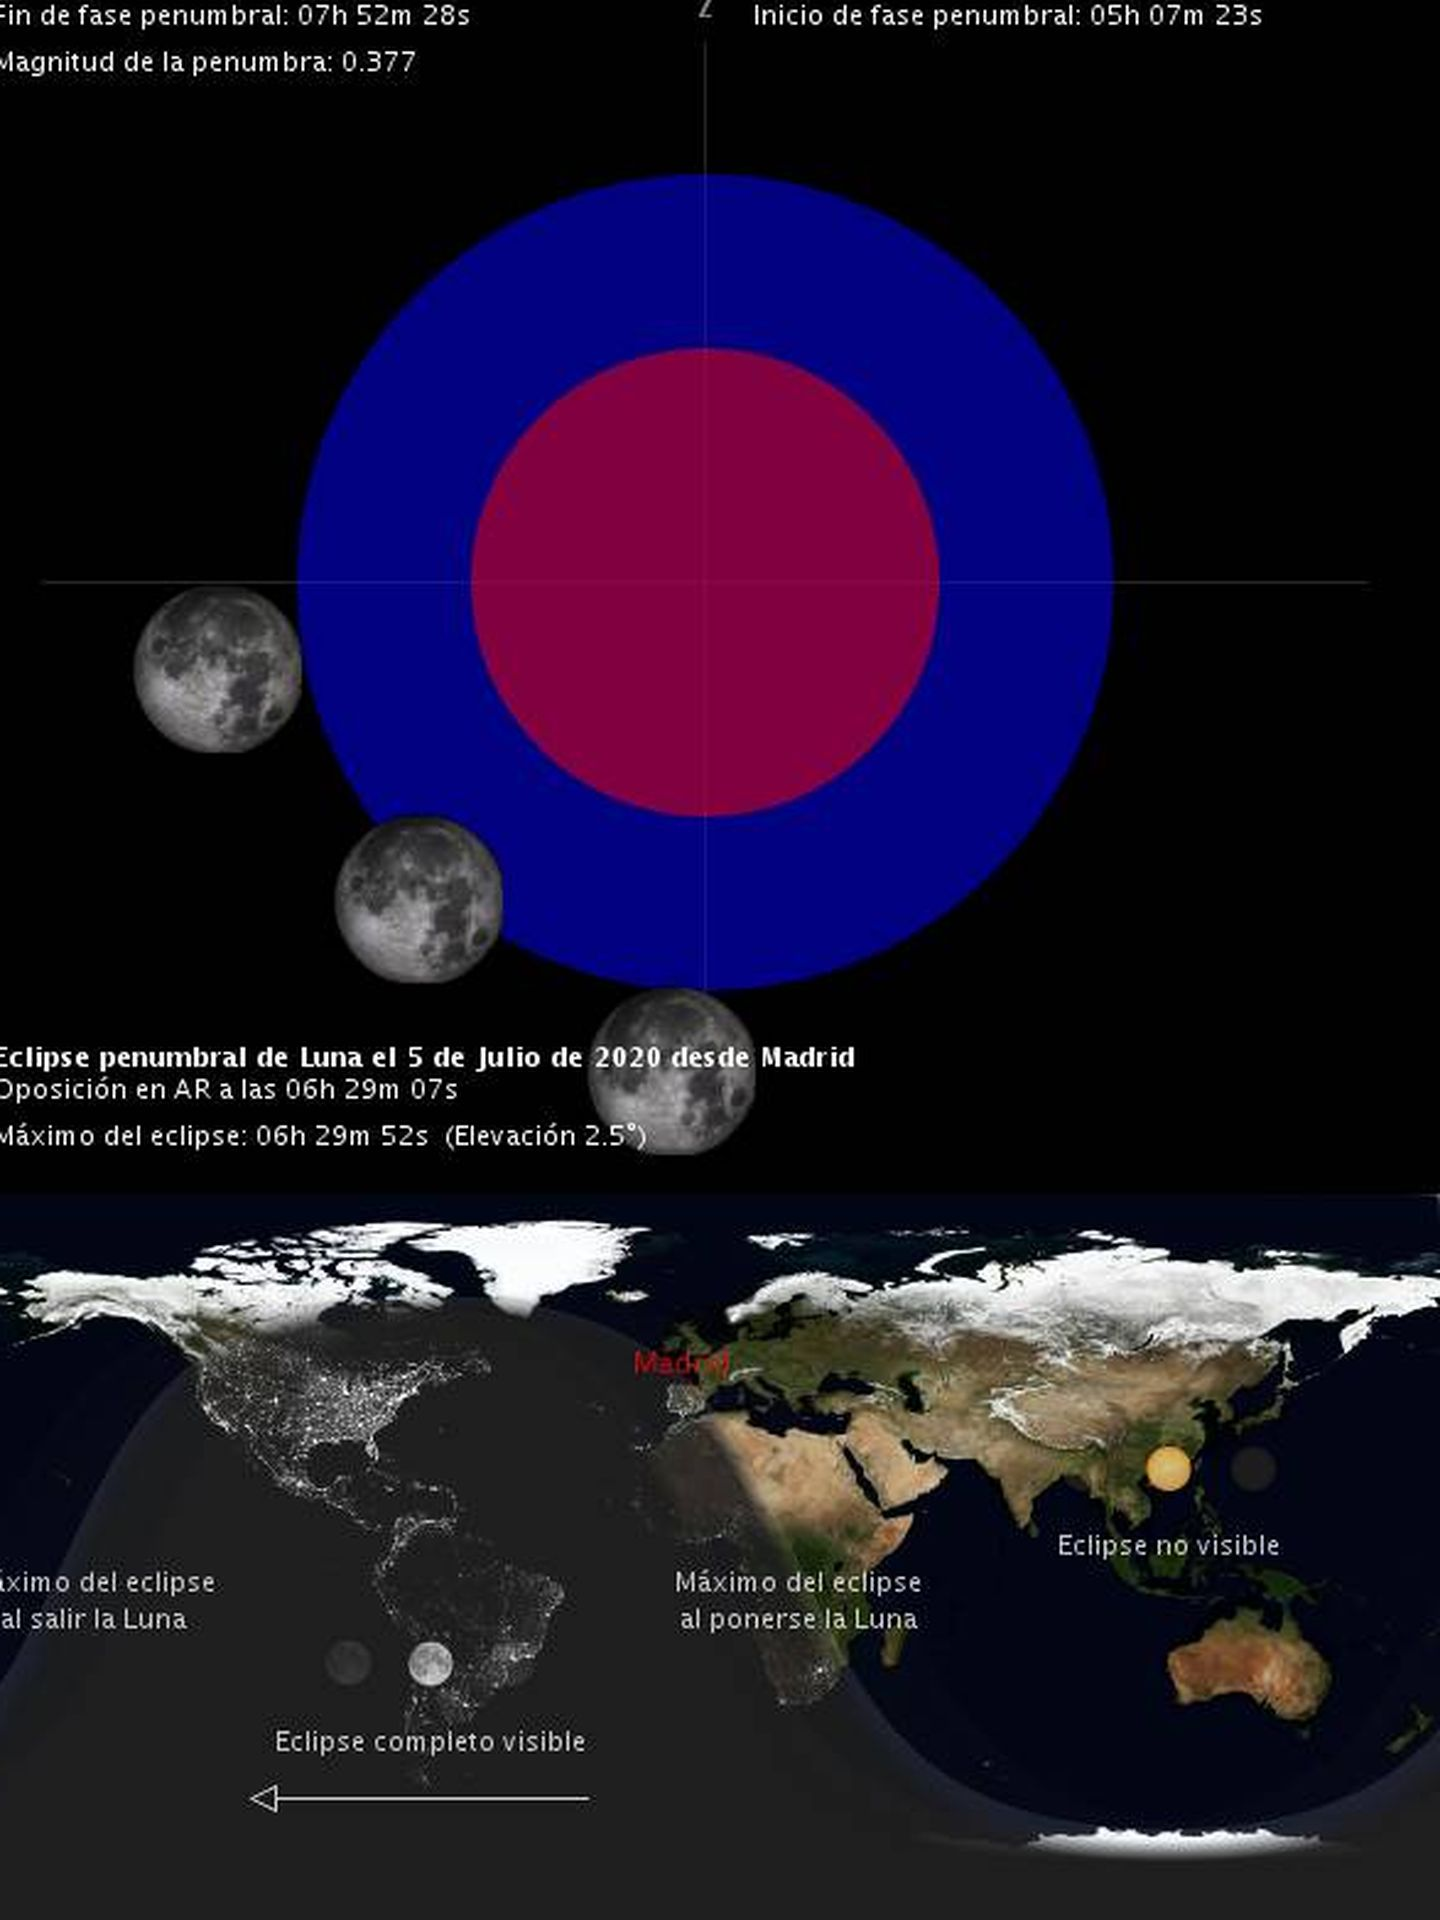 Eclipse penumbral de Luna del 5 de julio. (OAN)